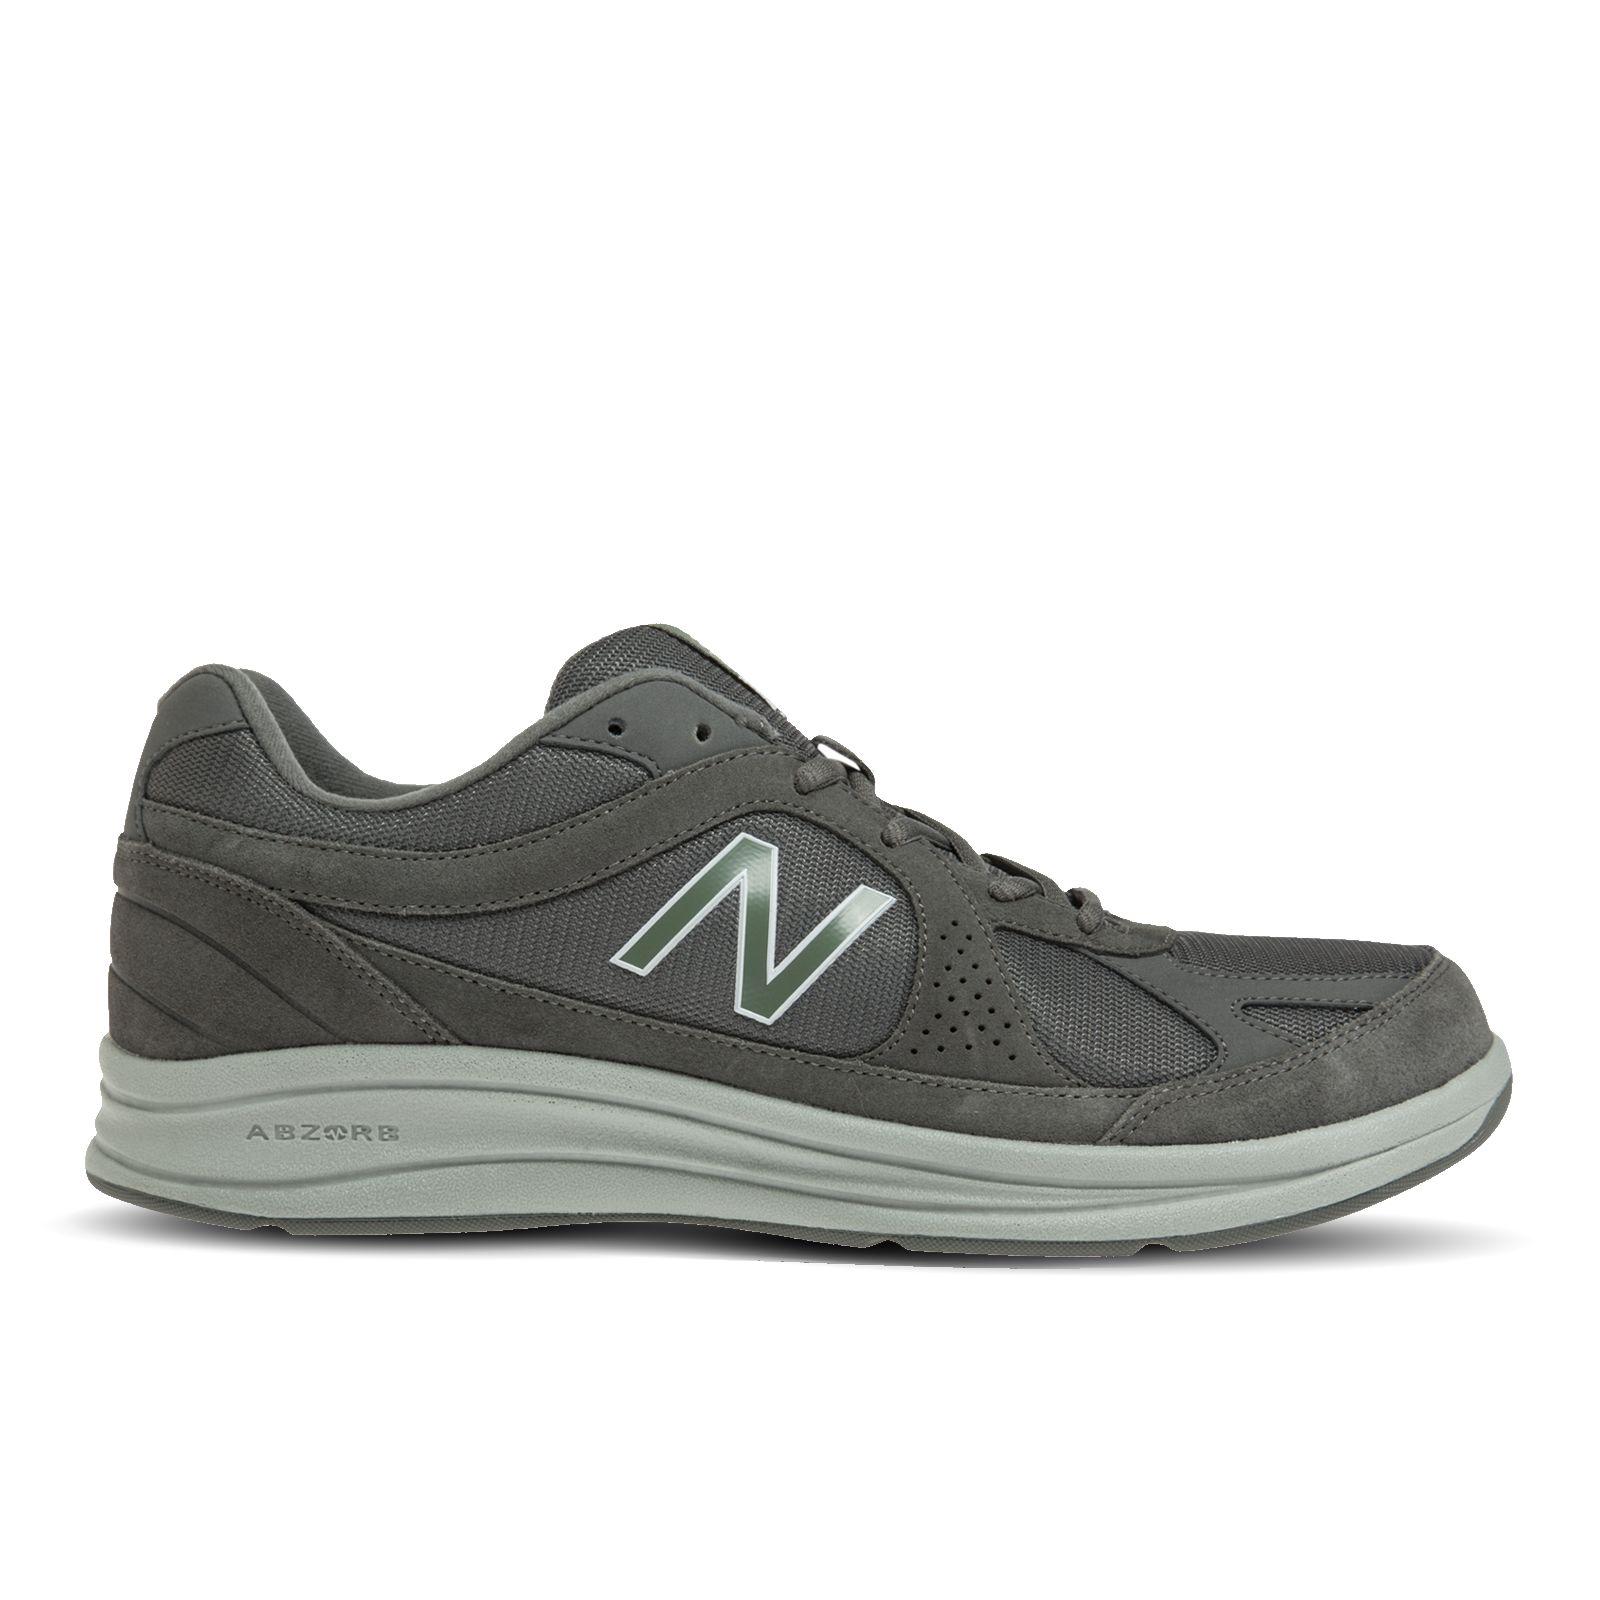 buy new balance walking shoes